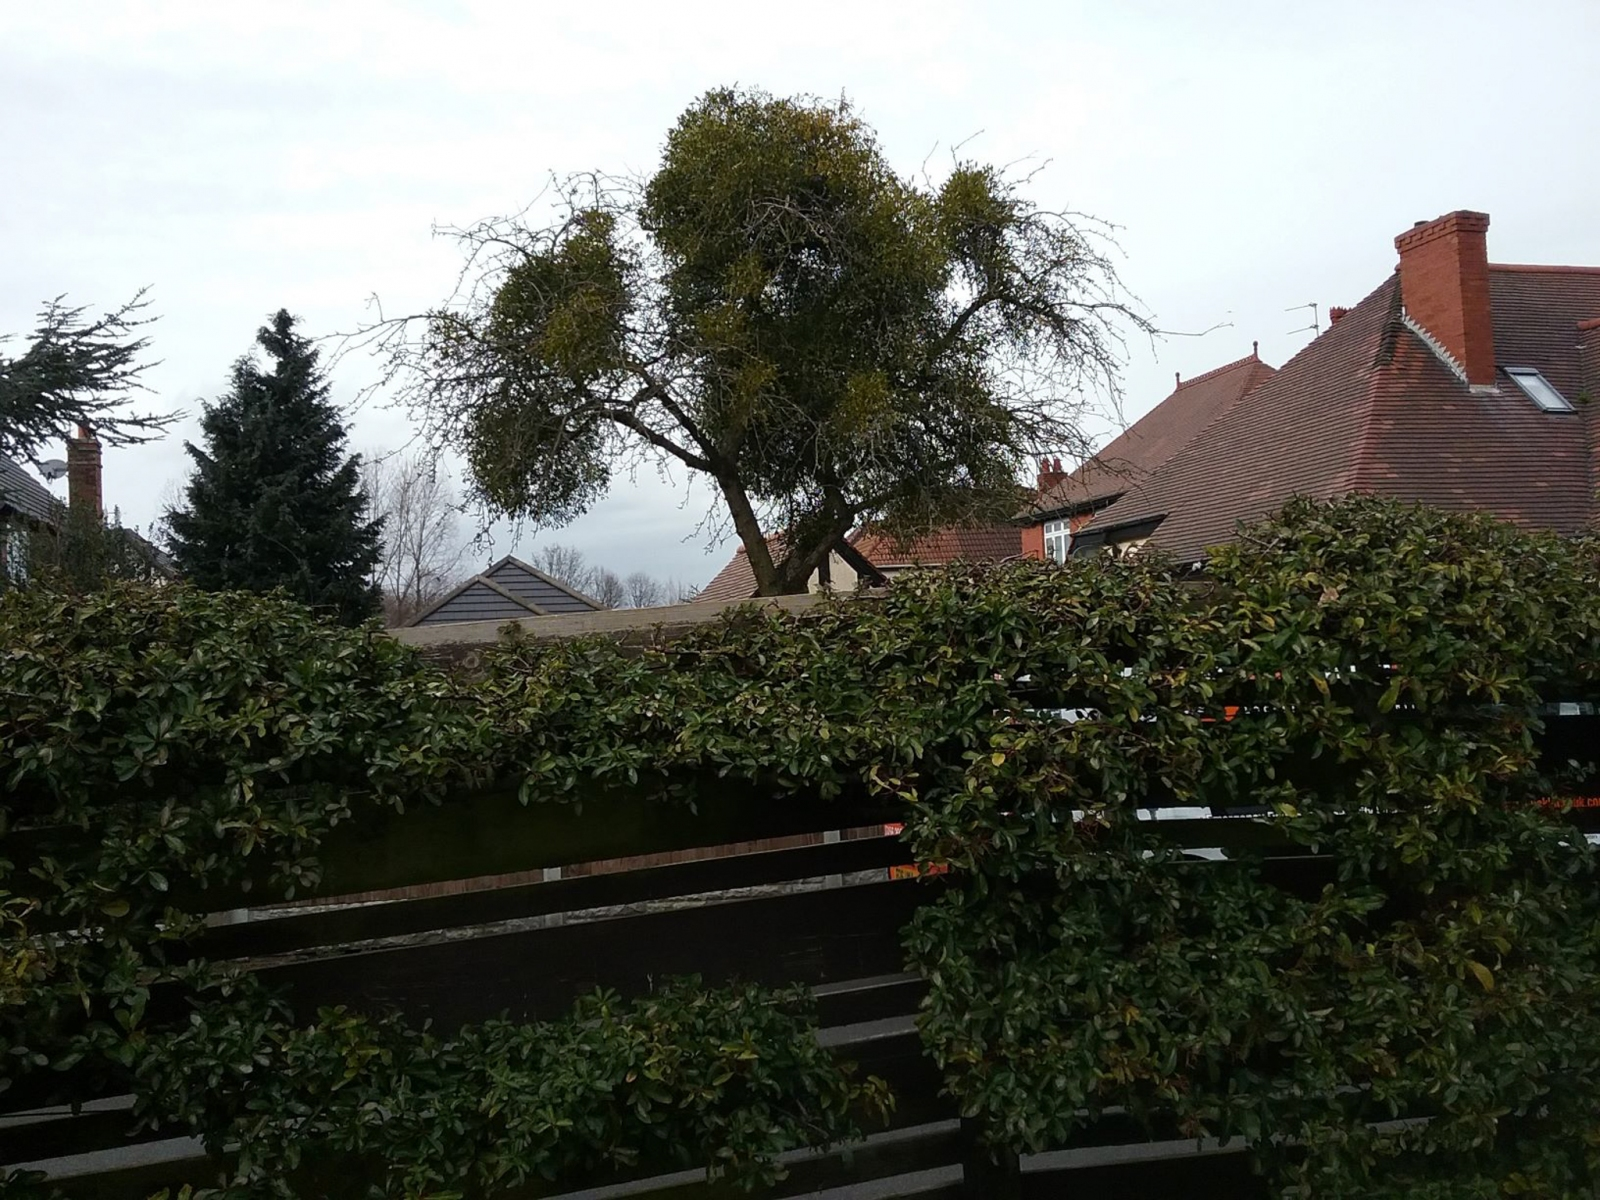 Mistletoe (Viscum album), near Bawtry Road, Doncaster